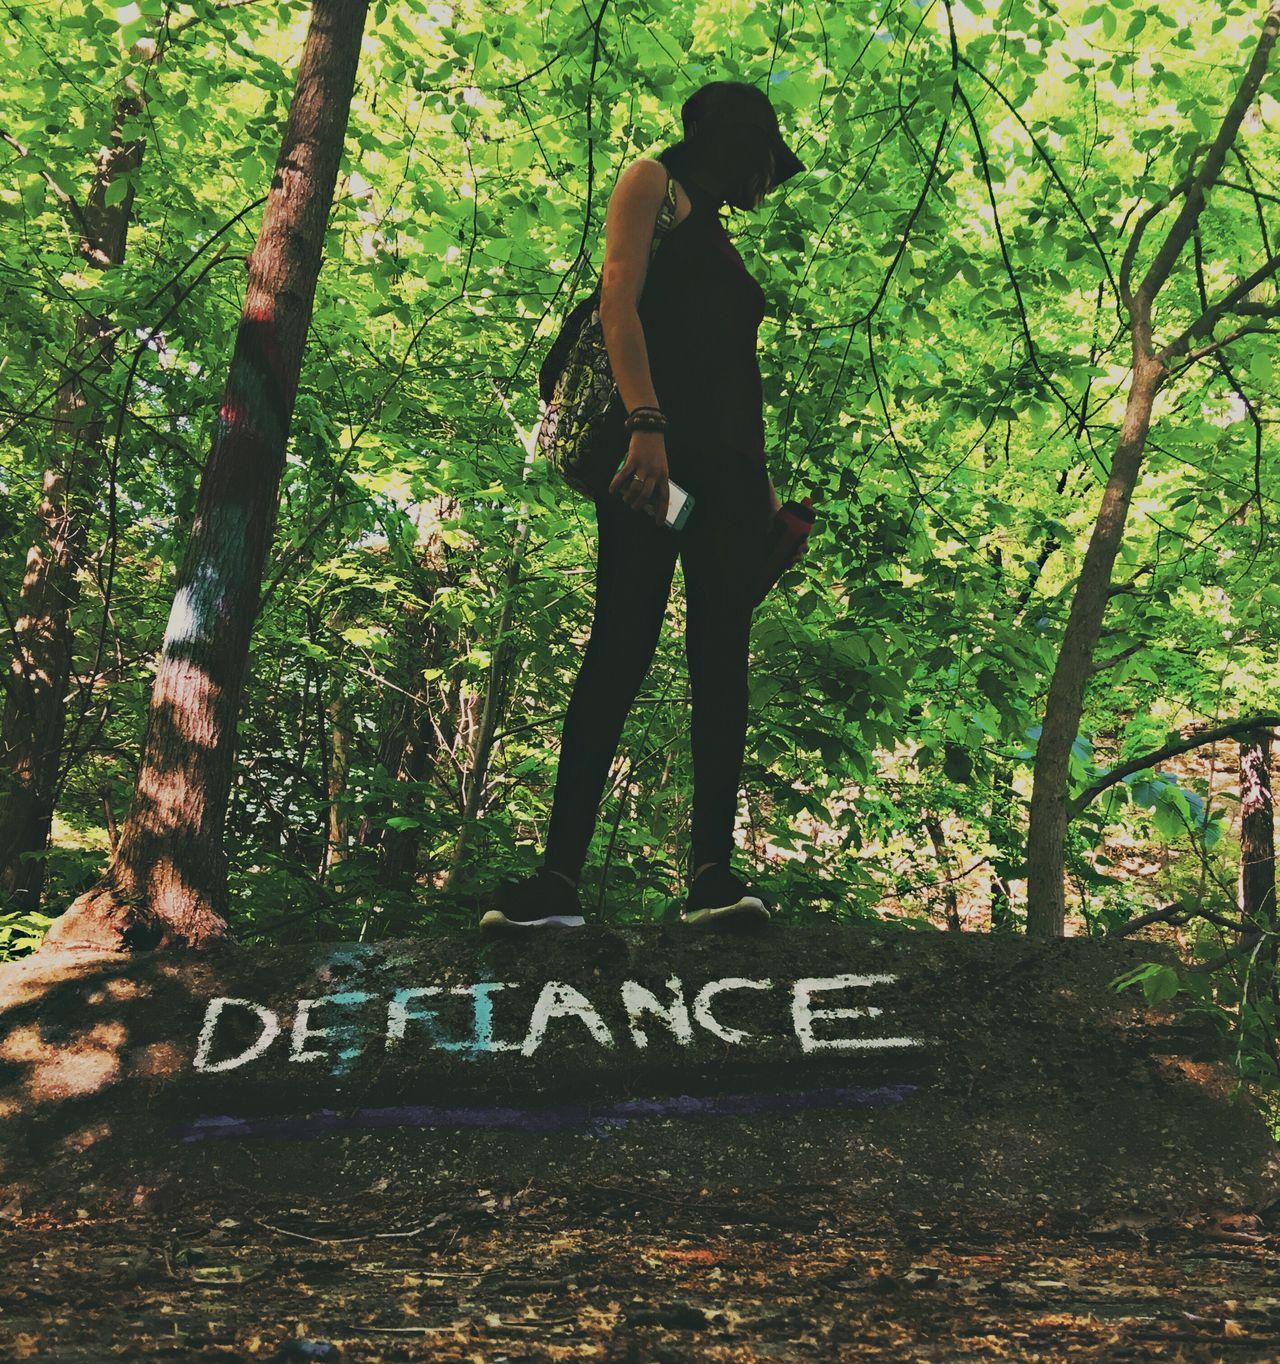 Defiance Model Nature